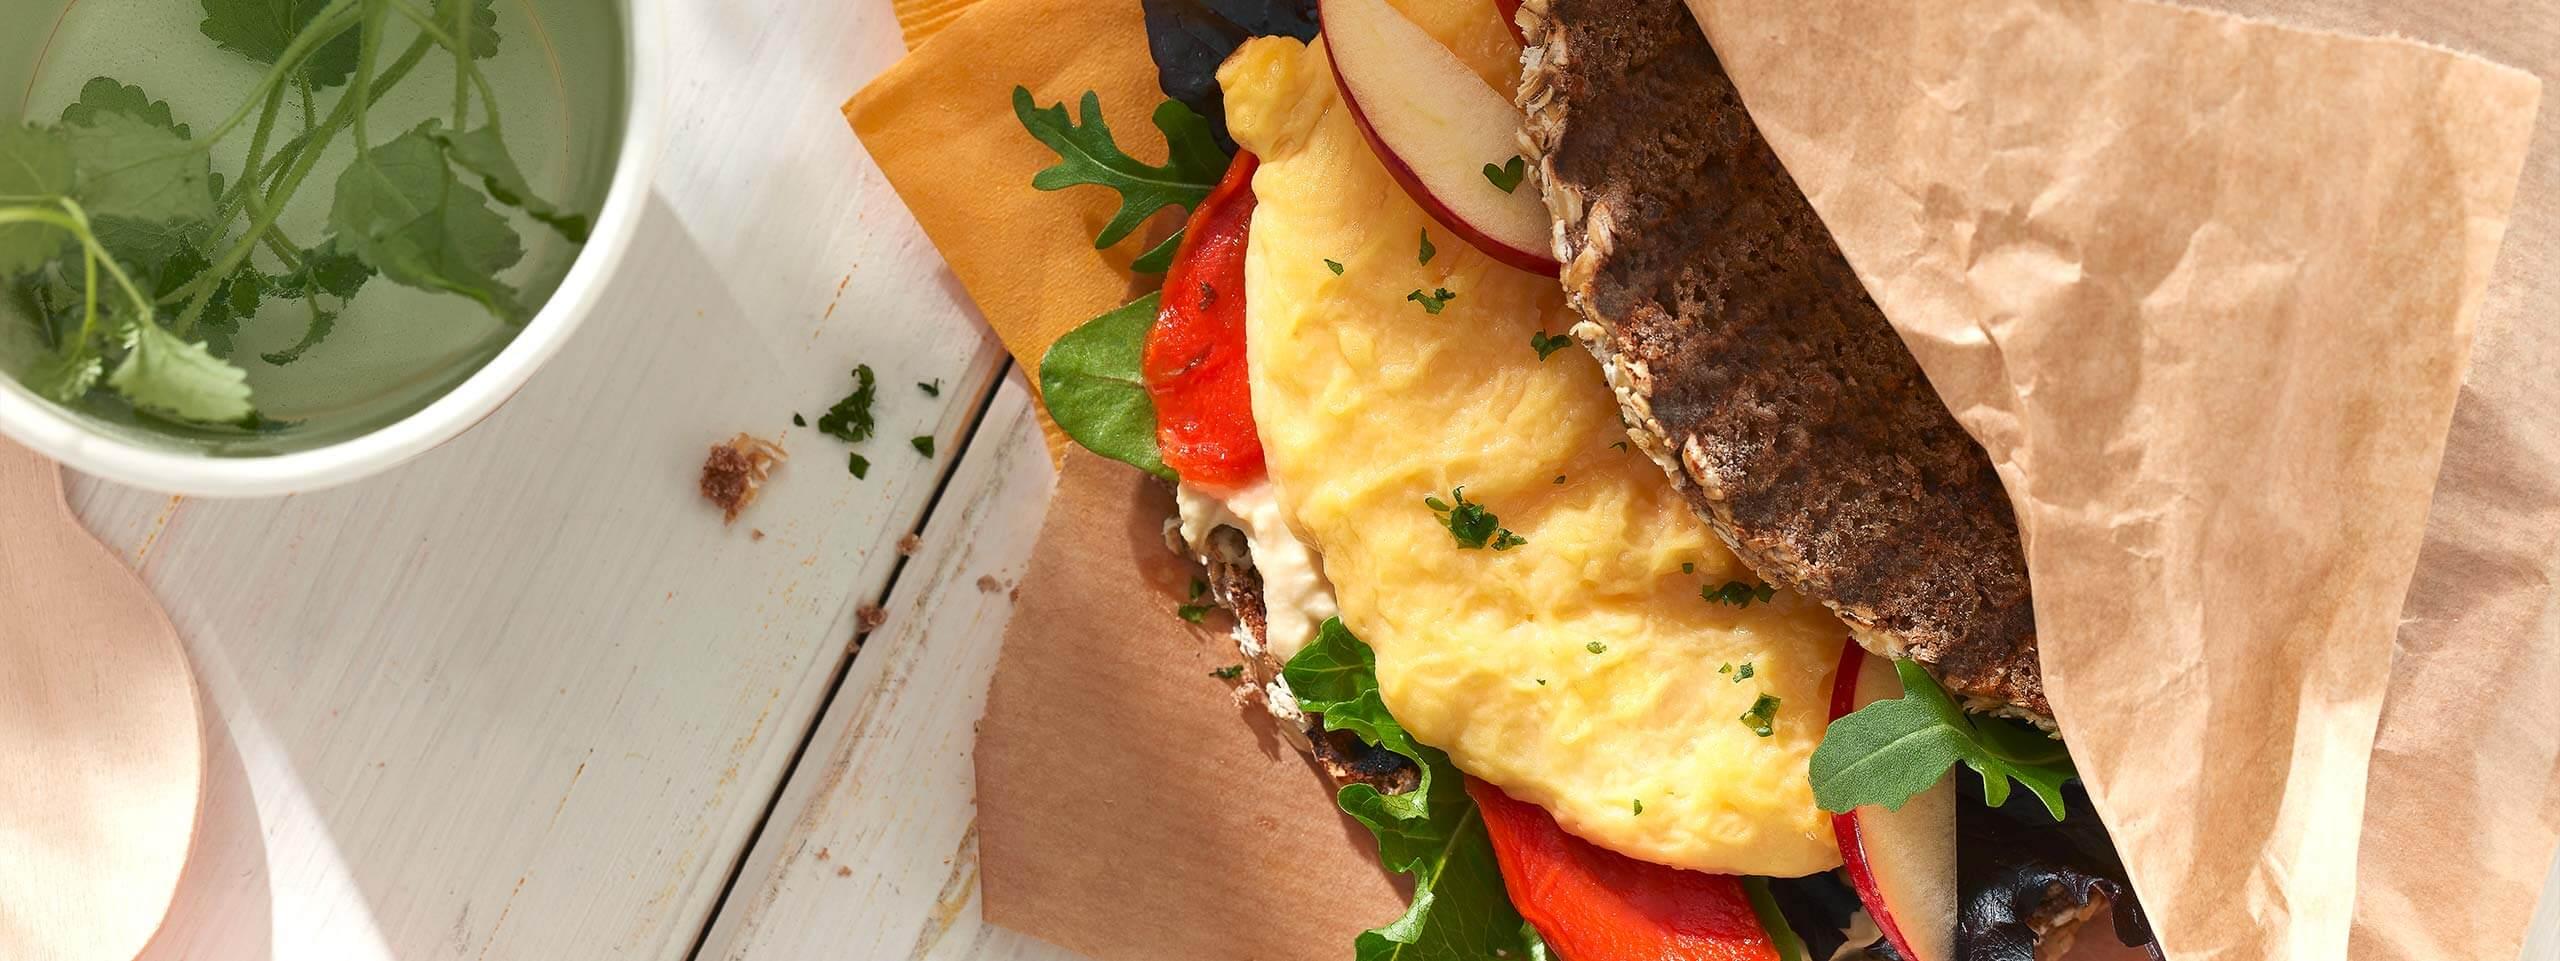 Brot-Sandwich